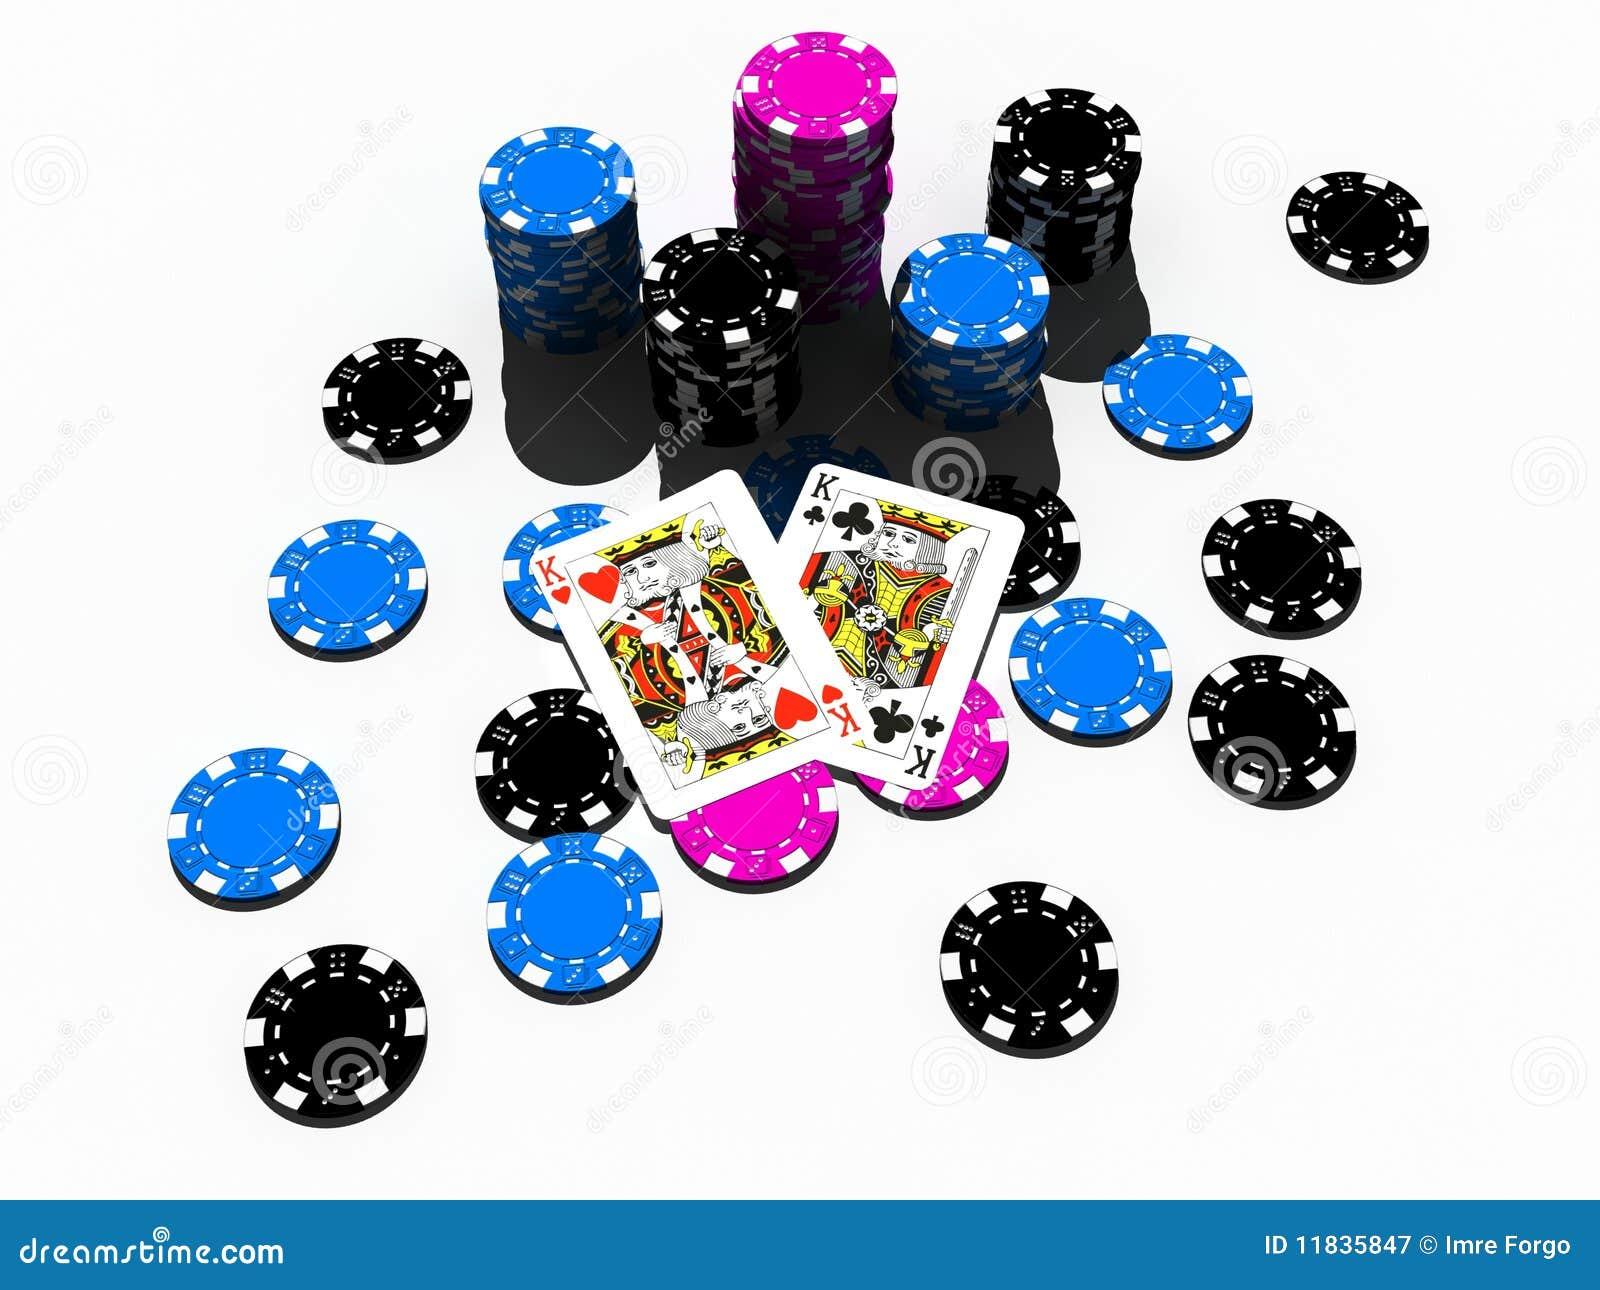 2 pair poker tour twitter login problems